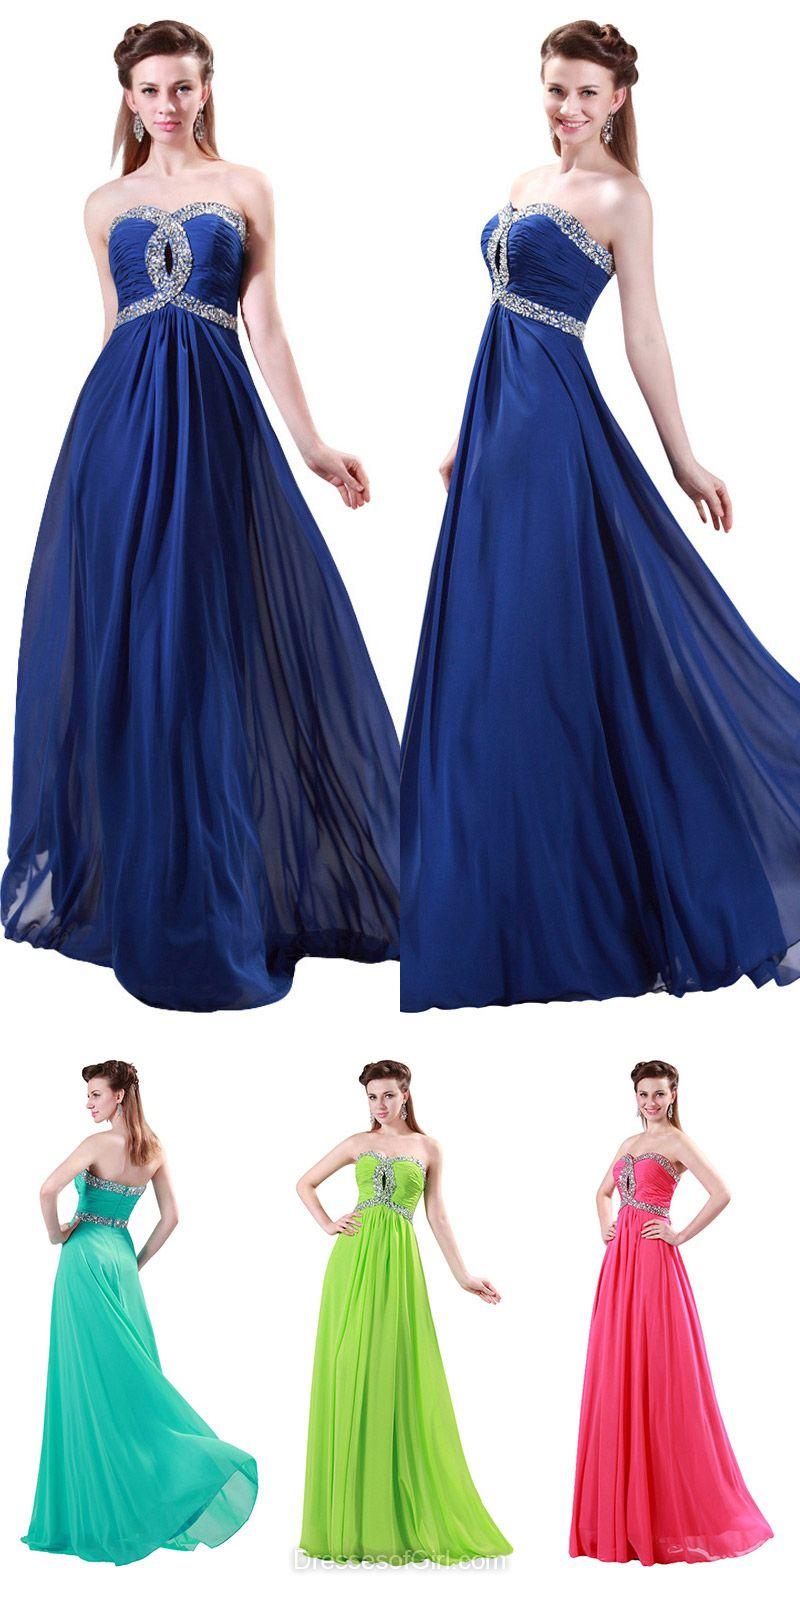 Aline sweetheart prom dresses chiffon long formal dresses latest